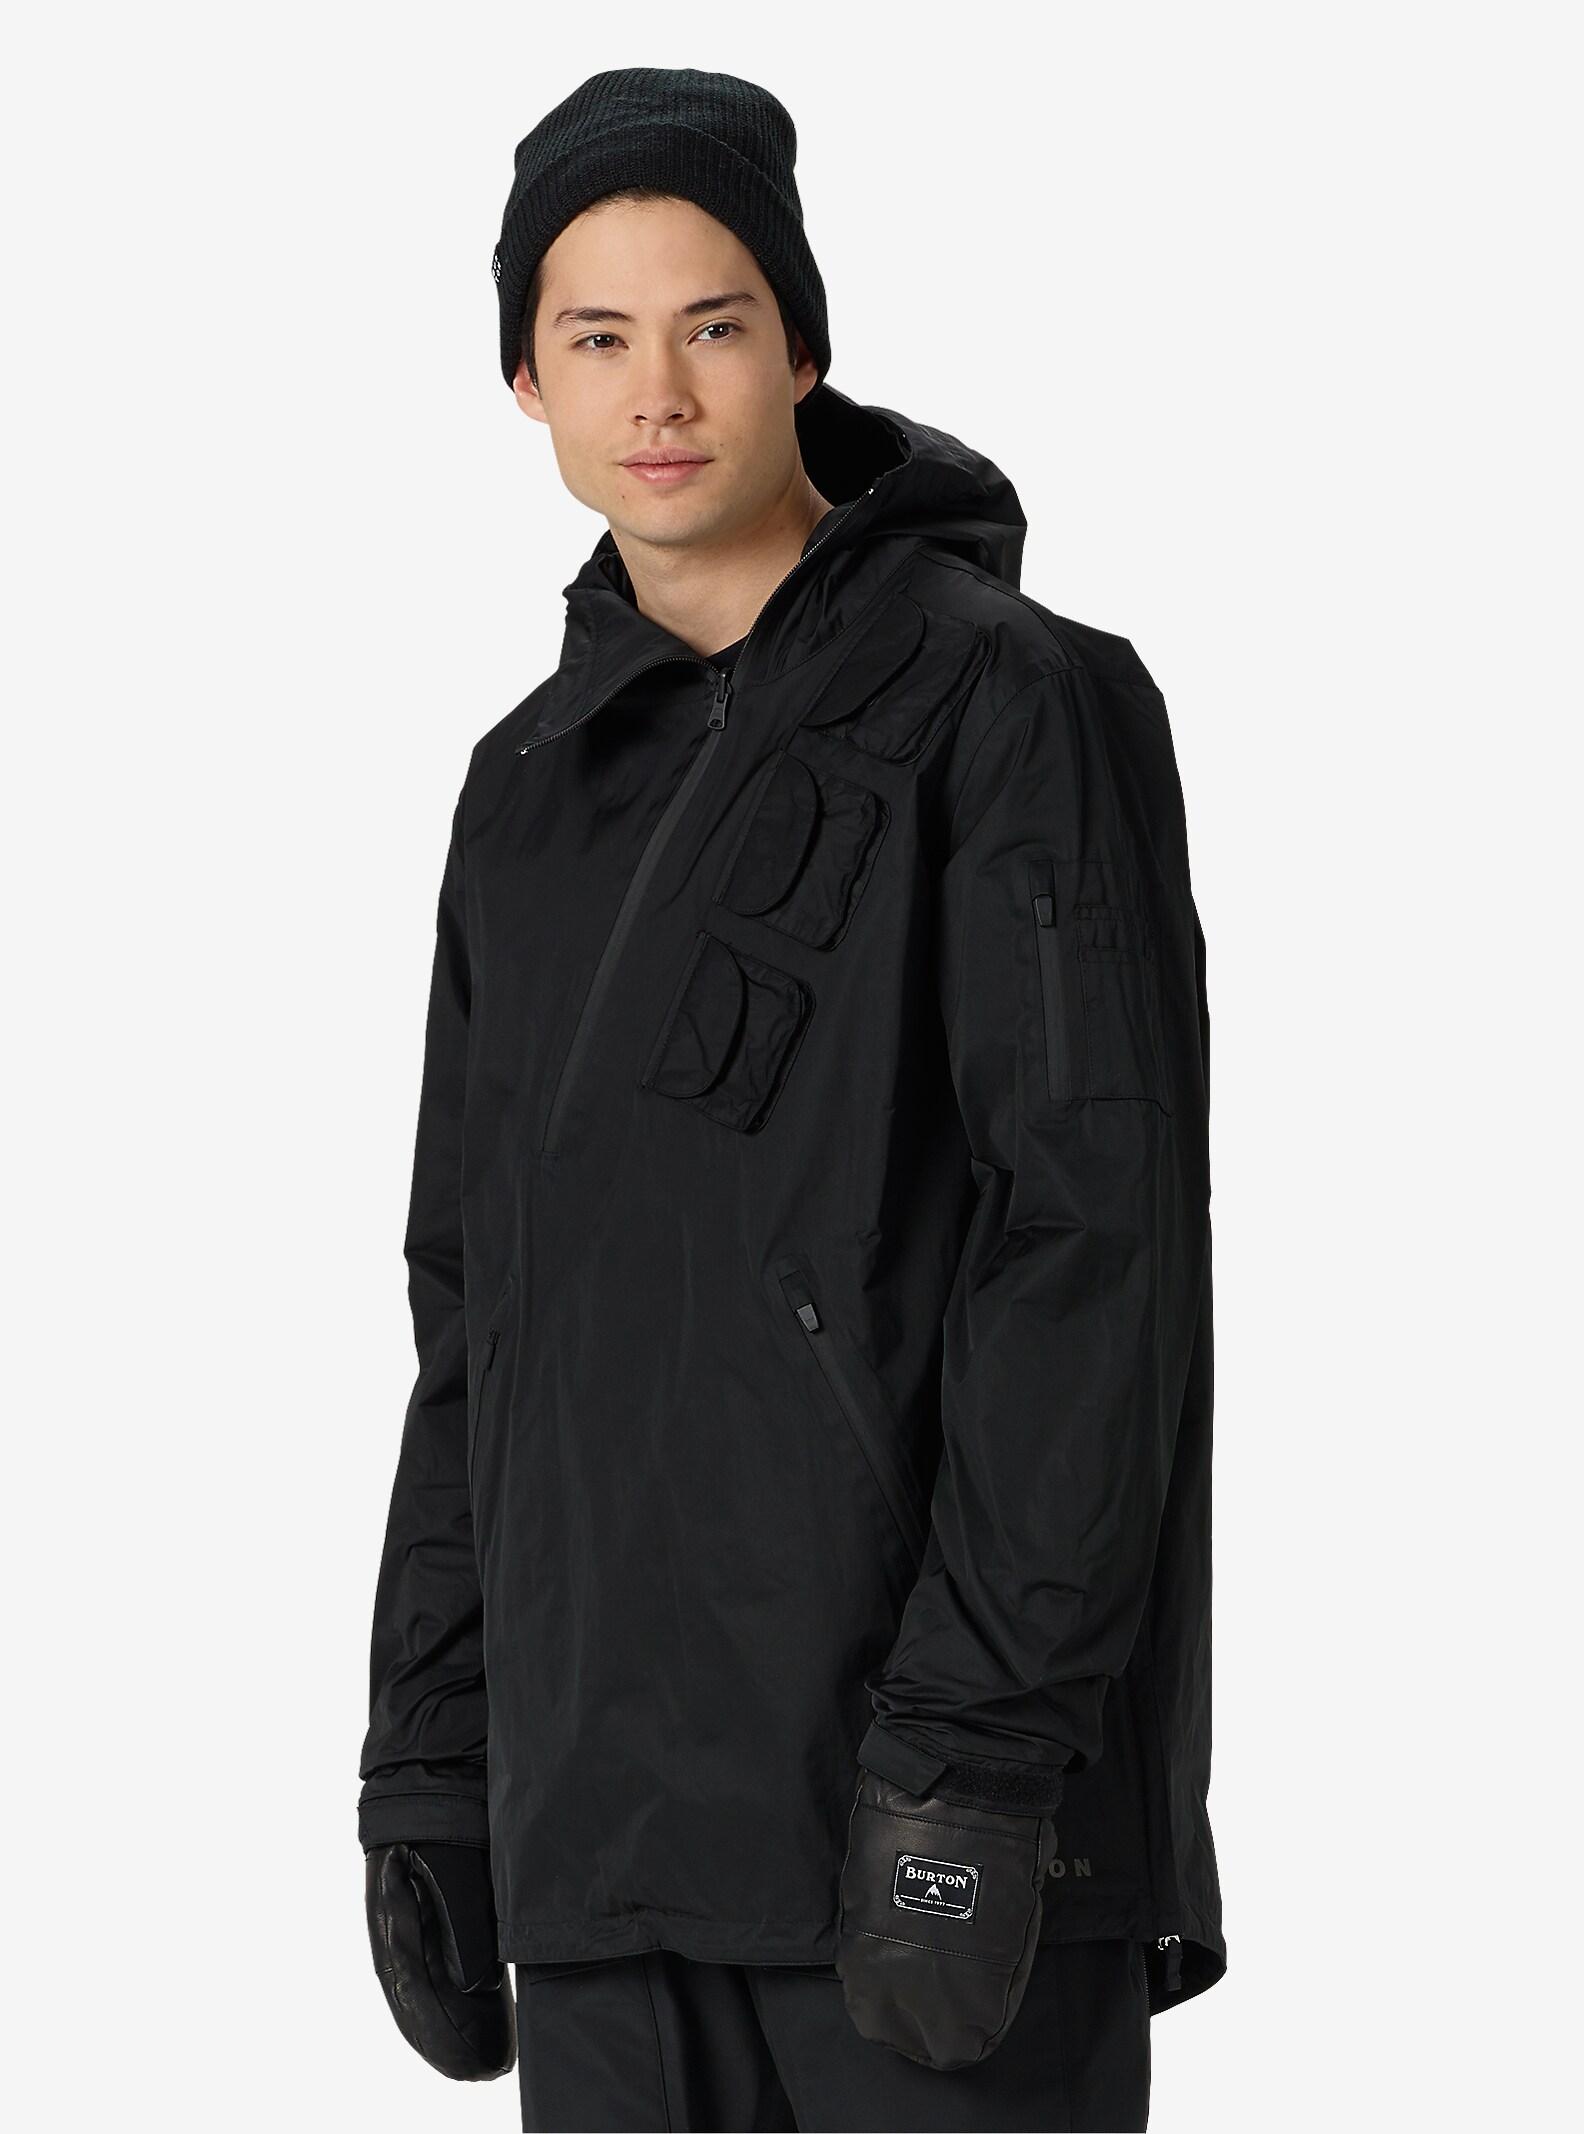 Black Scale x Burton Raid Reversible Anorak Jacket shown in Black Scale Black / Big Tiger